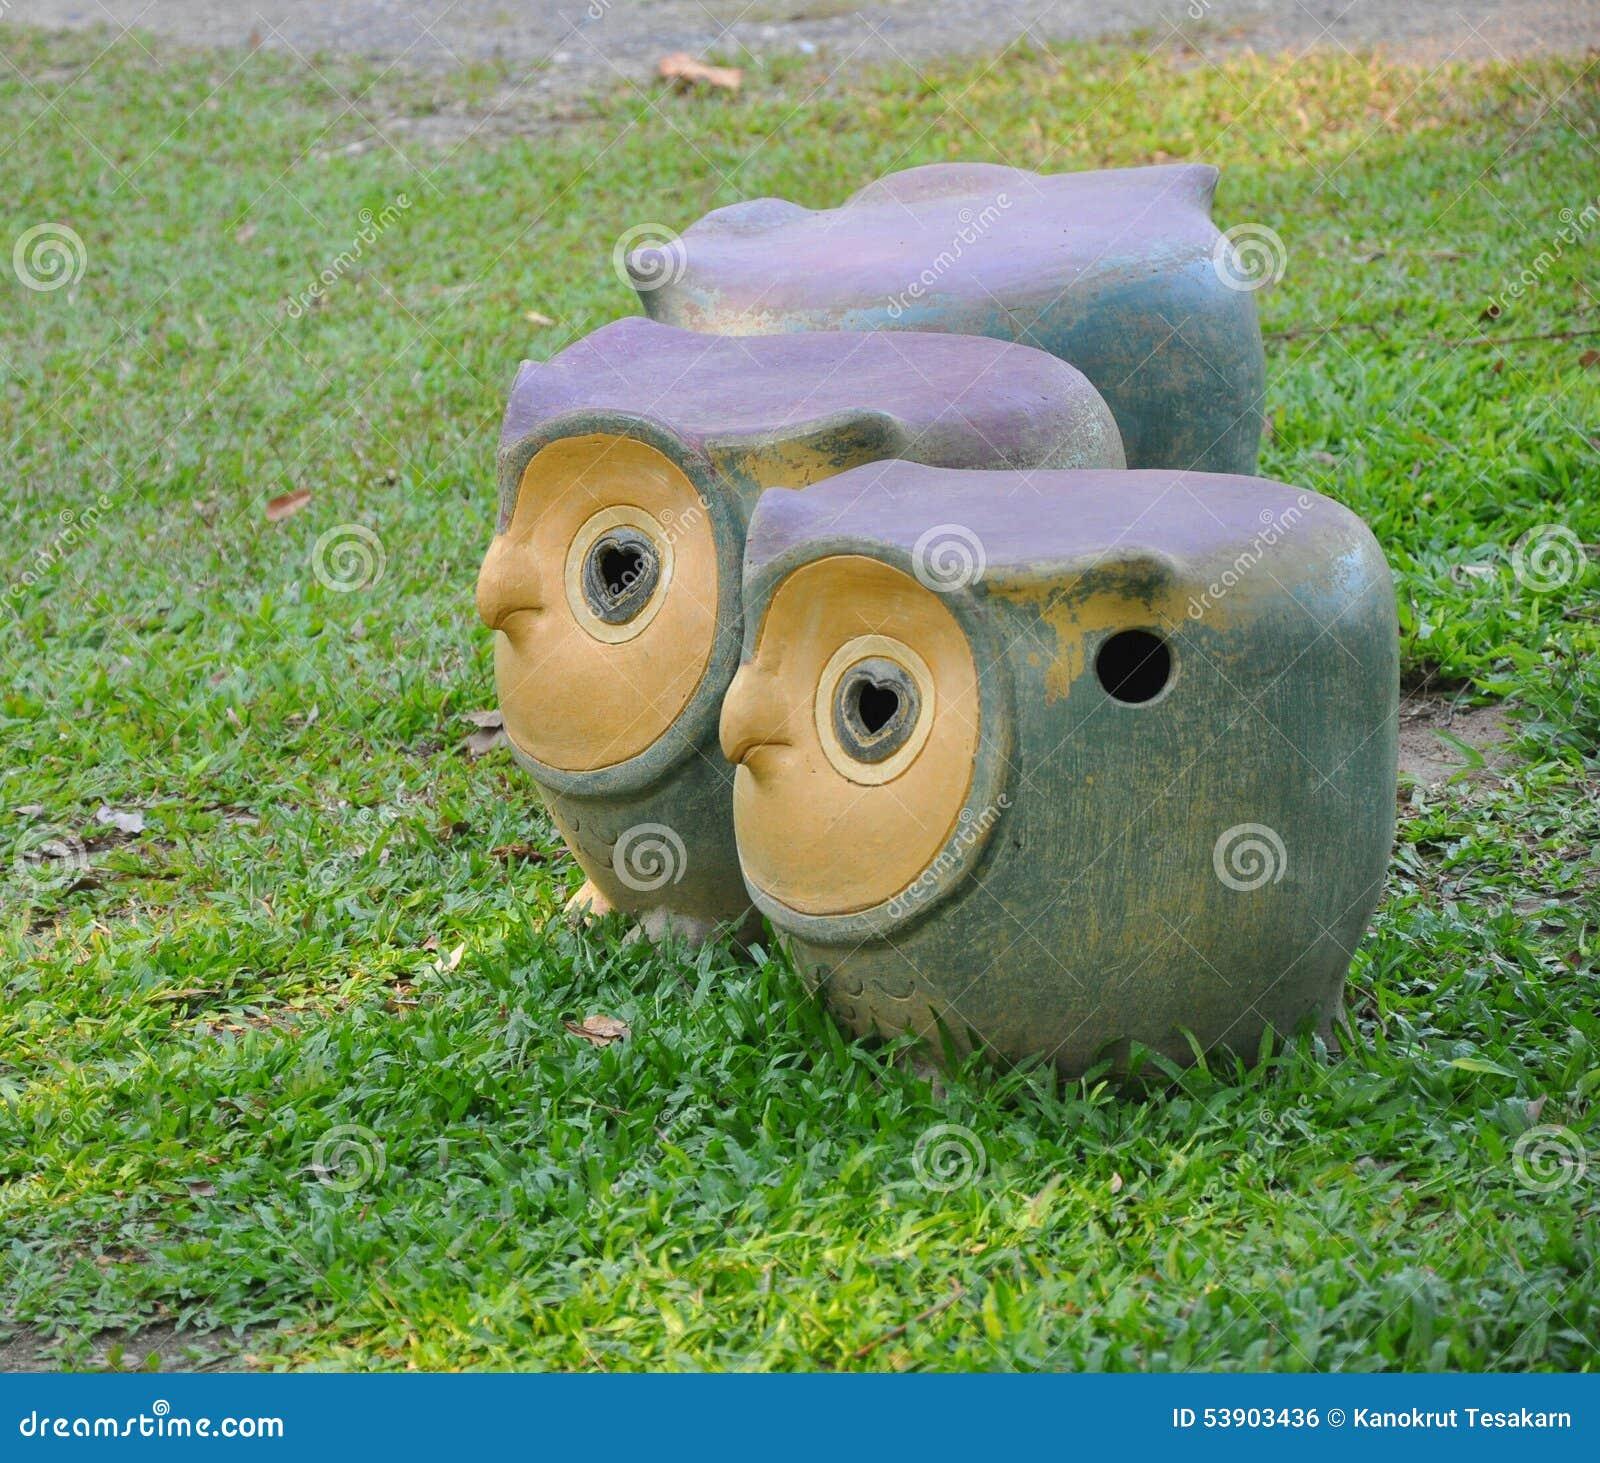 Owl Garden Stool On Green Lawn